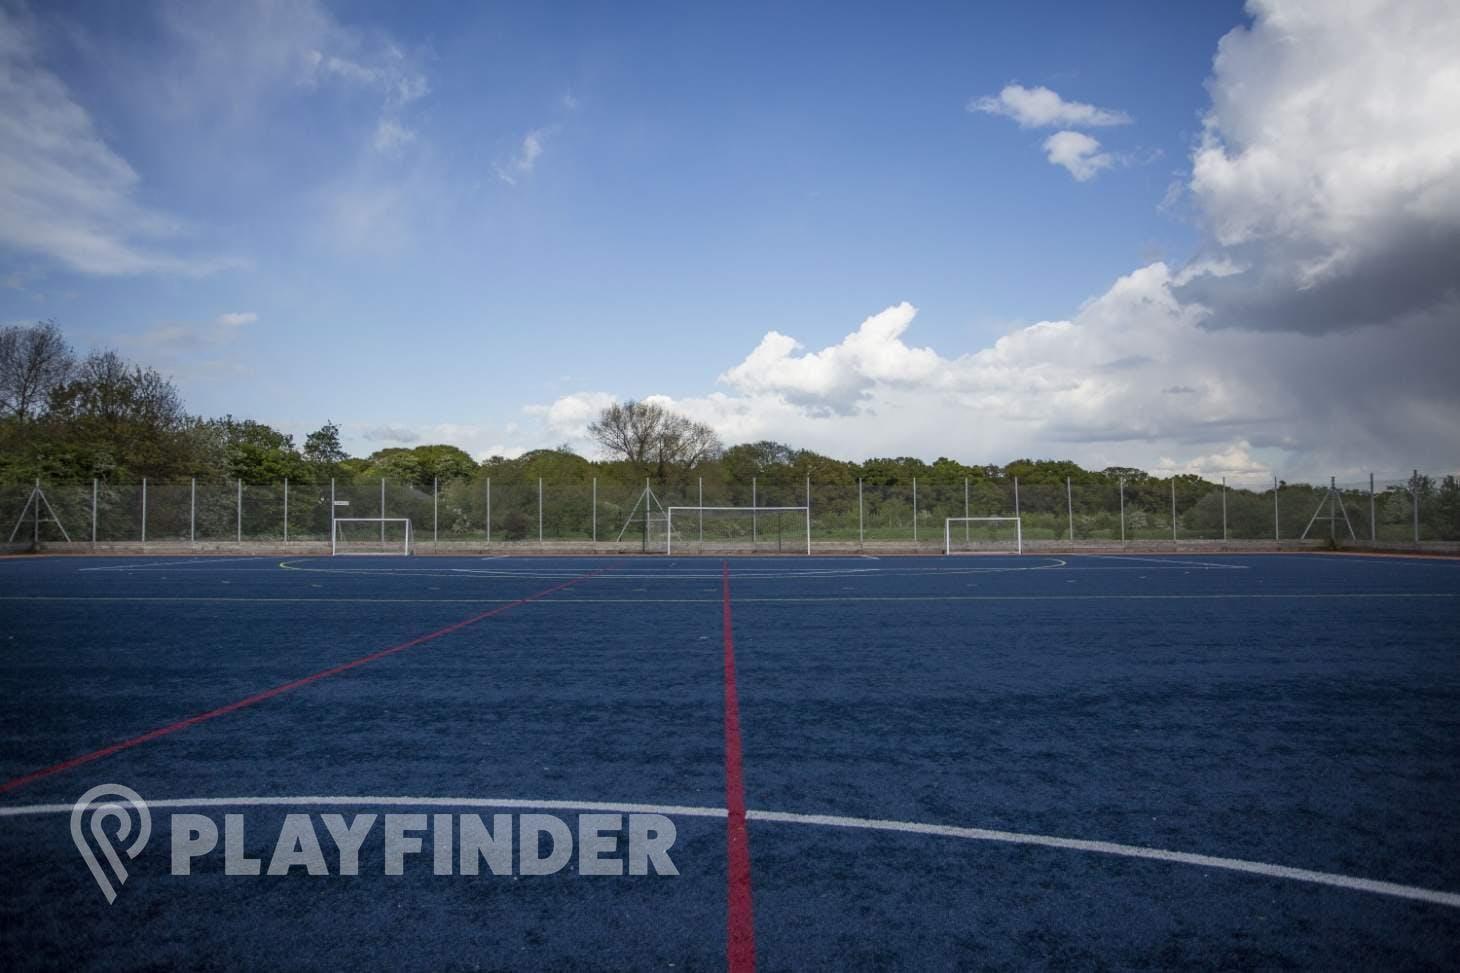 Powerleague Finchley 7 a side | 3G Astroturf football pitch